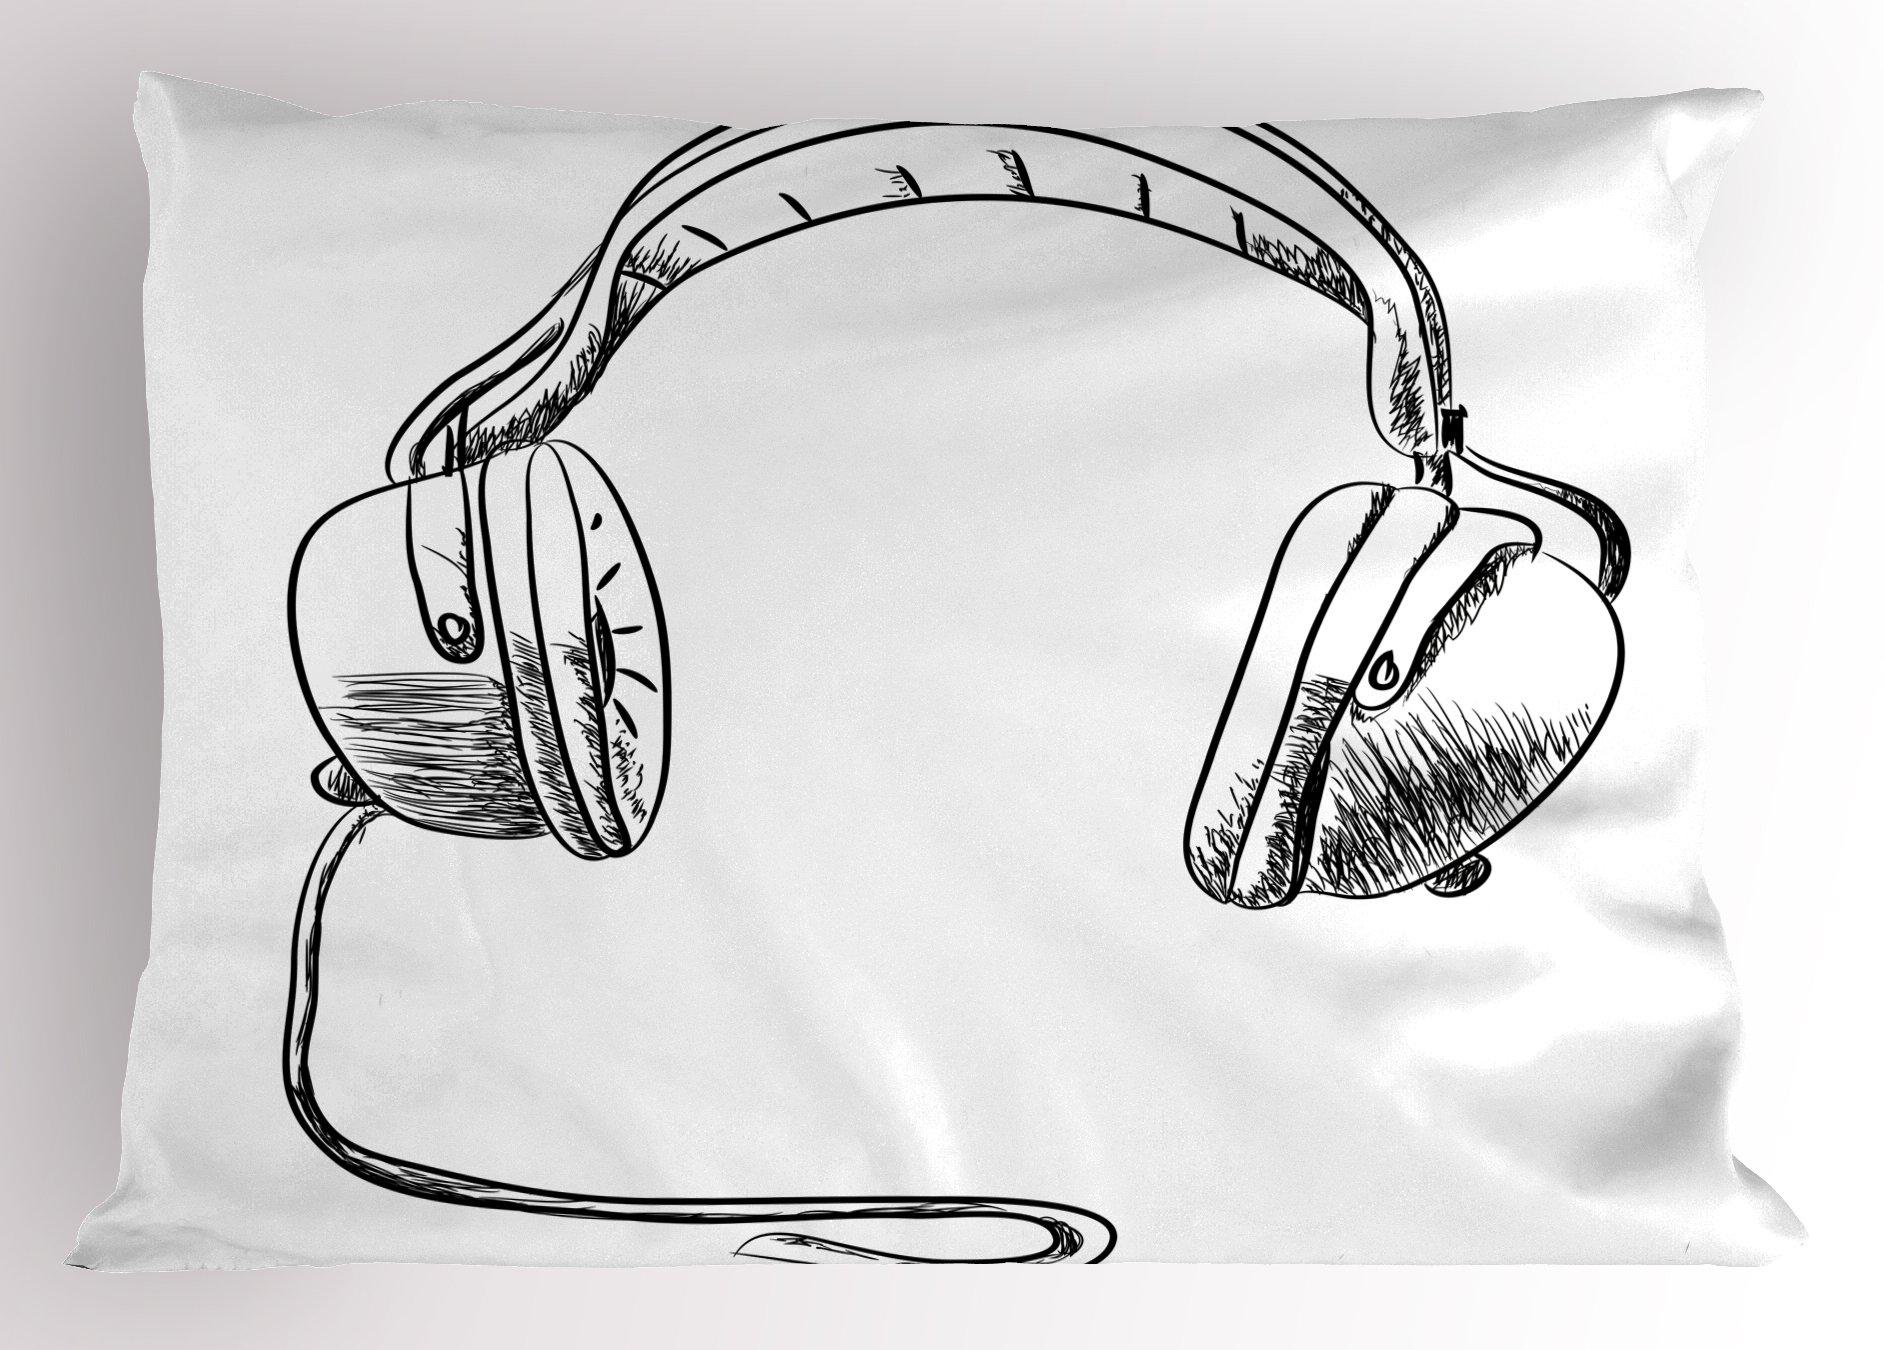 Ambesonne Music Pillow Sham, Sketch Style Hand Drawn DJ Headphones Rhythm Radio Modern Hippie Art Illustration, Decorative Standard Queen Size Printed Pillowcase, 30 X 20 inches, Black White